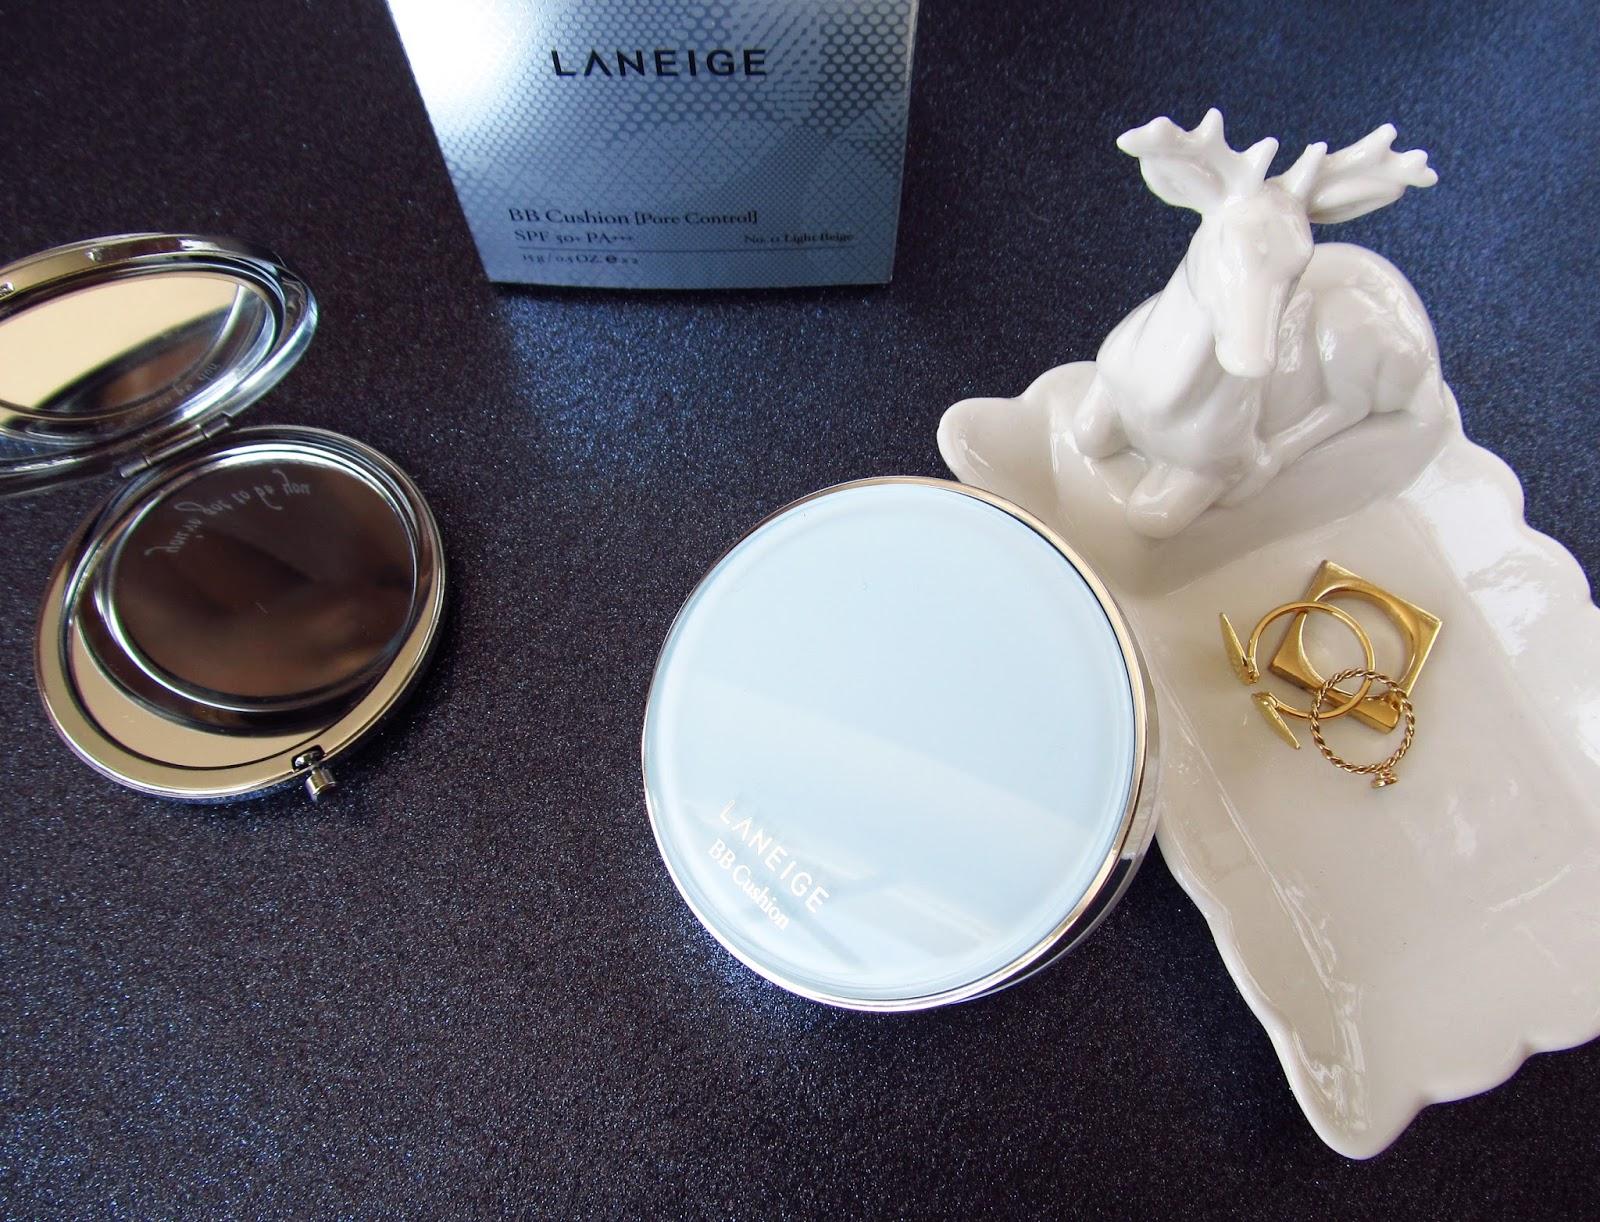 Passing Fancy Best Bb Alert Laneige Bb Cushion Pore Control Review